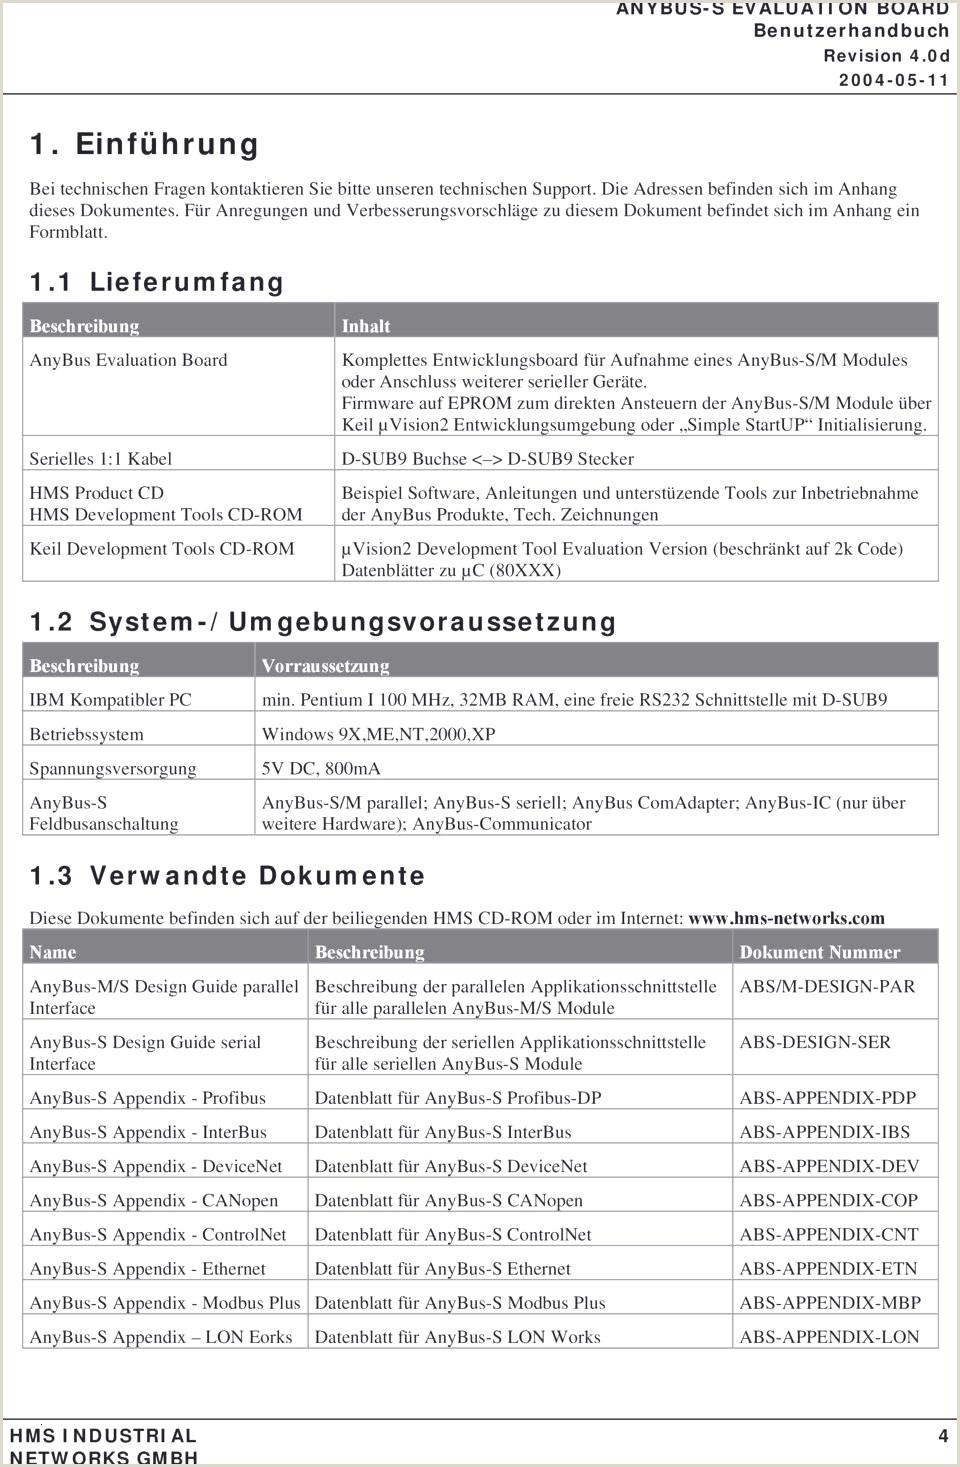 Lebenslauf Muster Word Ausbildung 48 Nouveau Mod¨le Cv Professionnel Xenakisworld